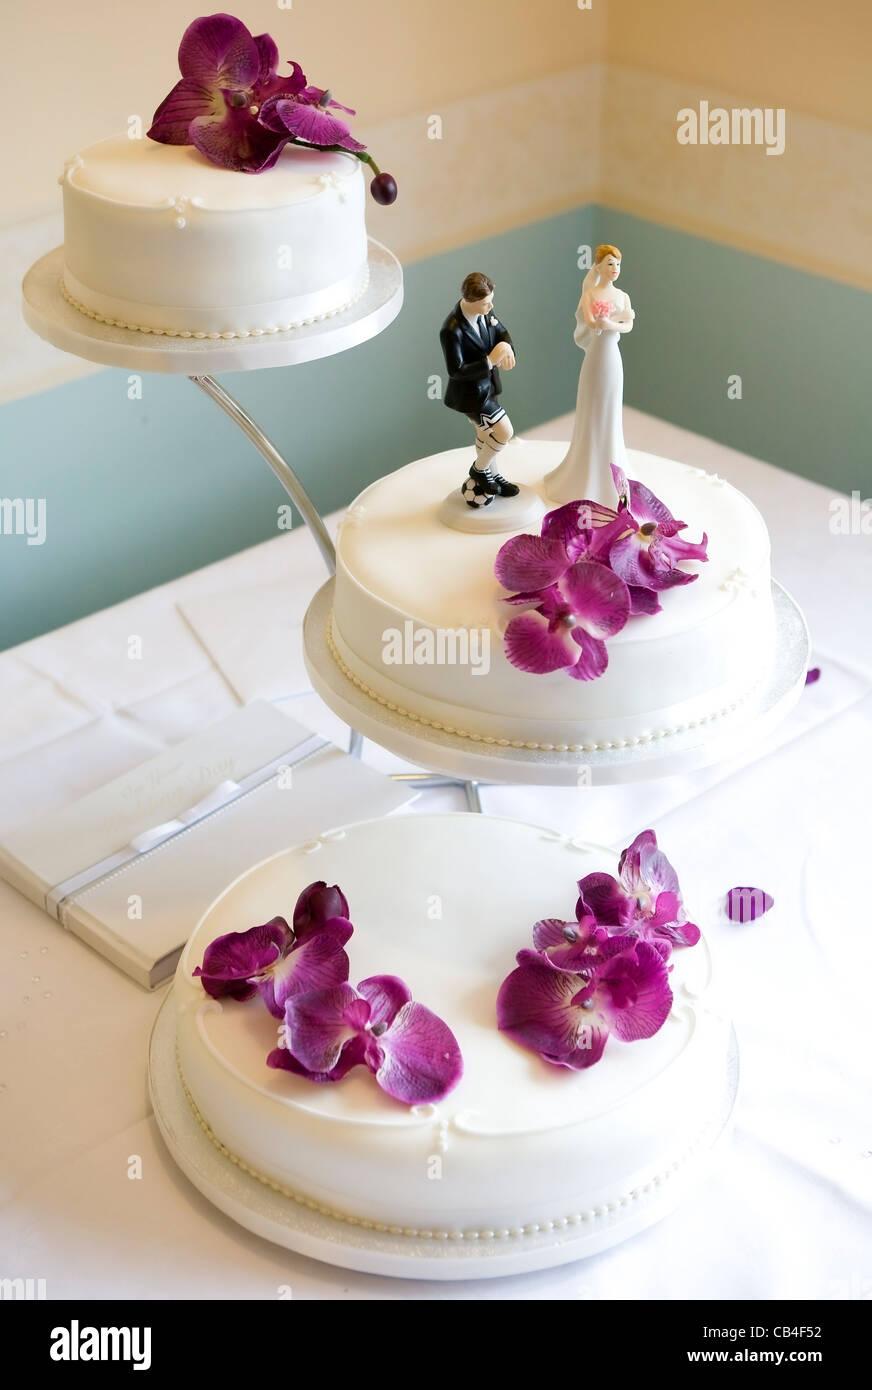 Wedding Football Stock Photos & Wedding Football Stock Images - Alamy